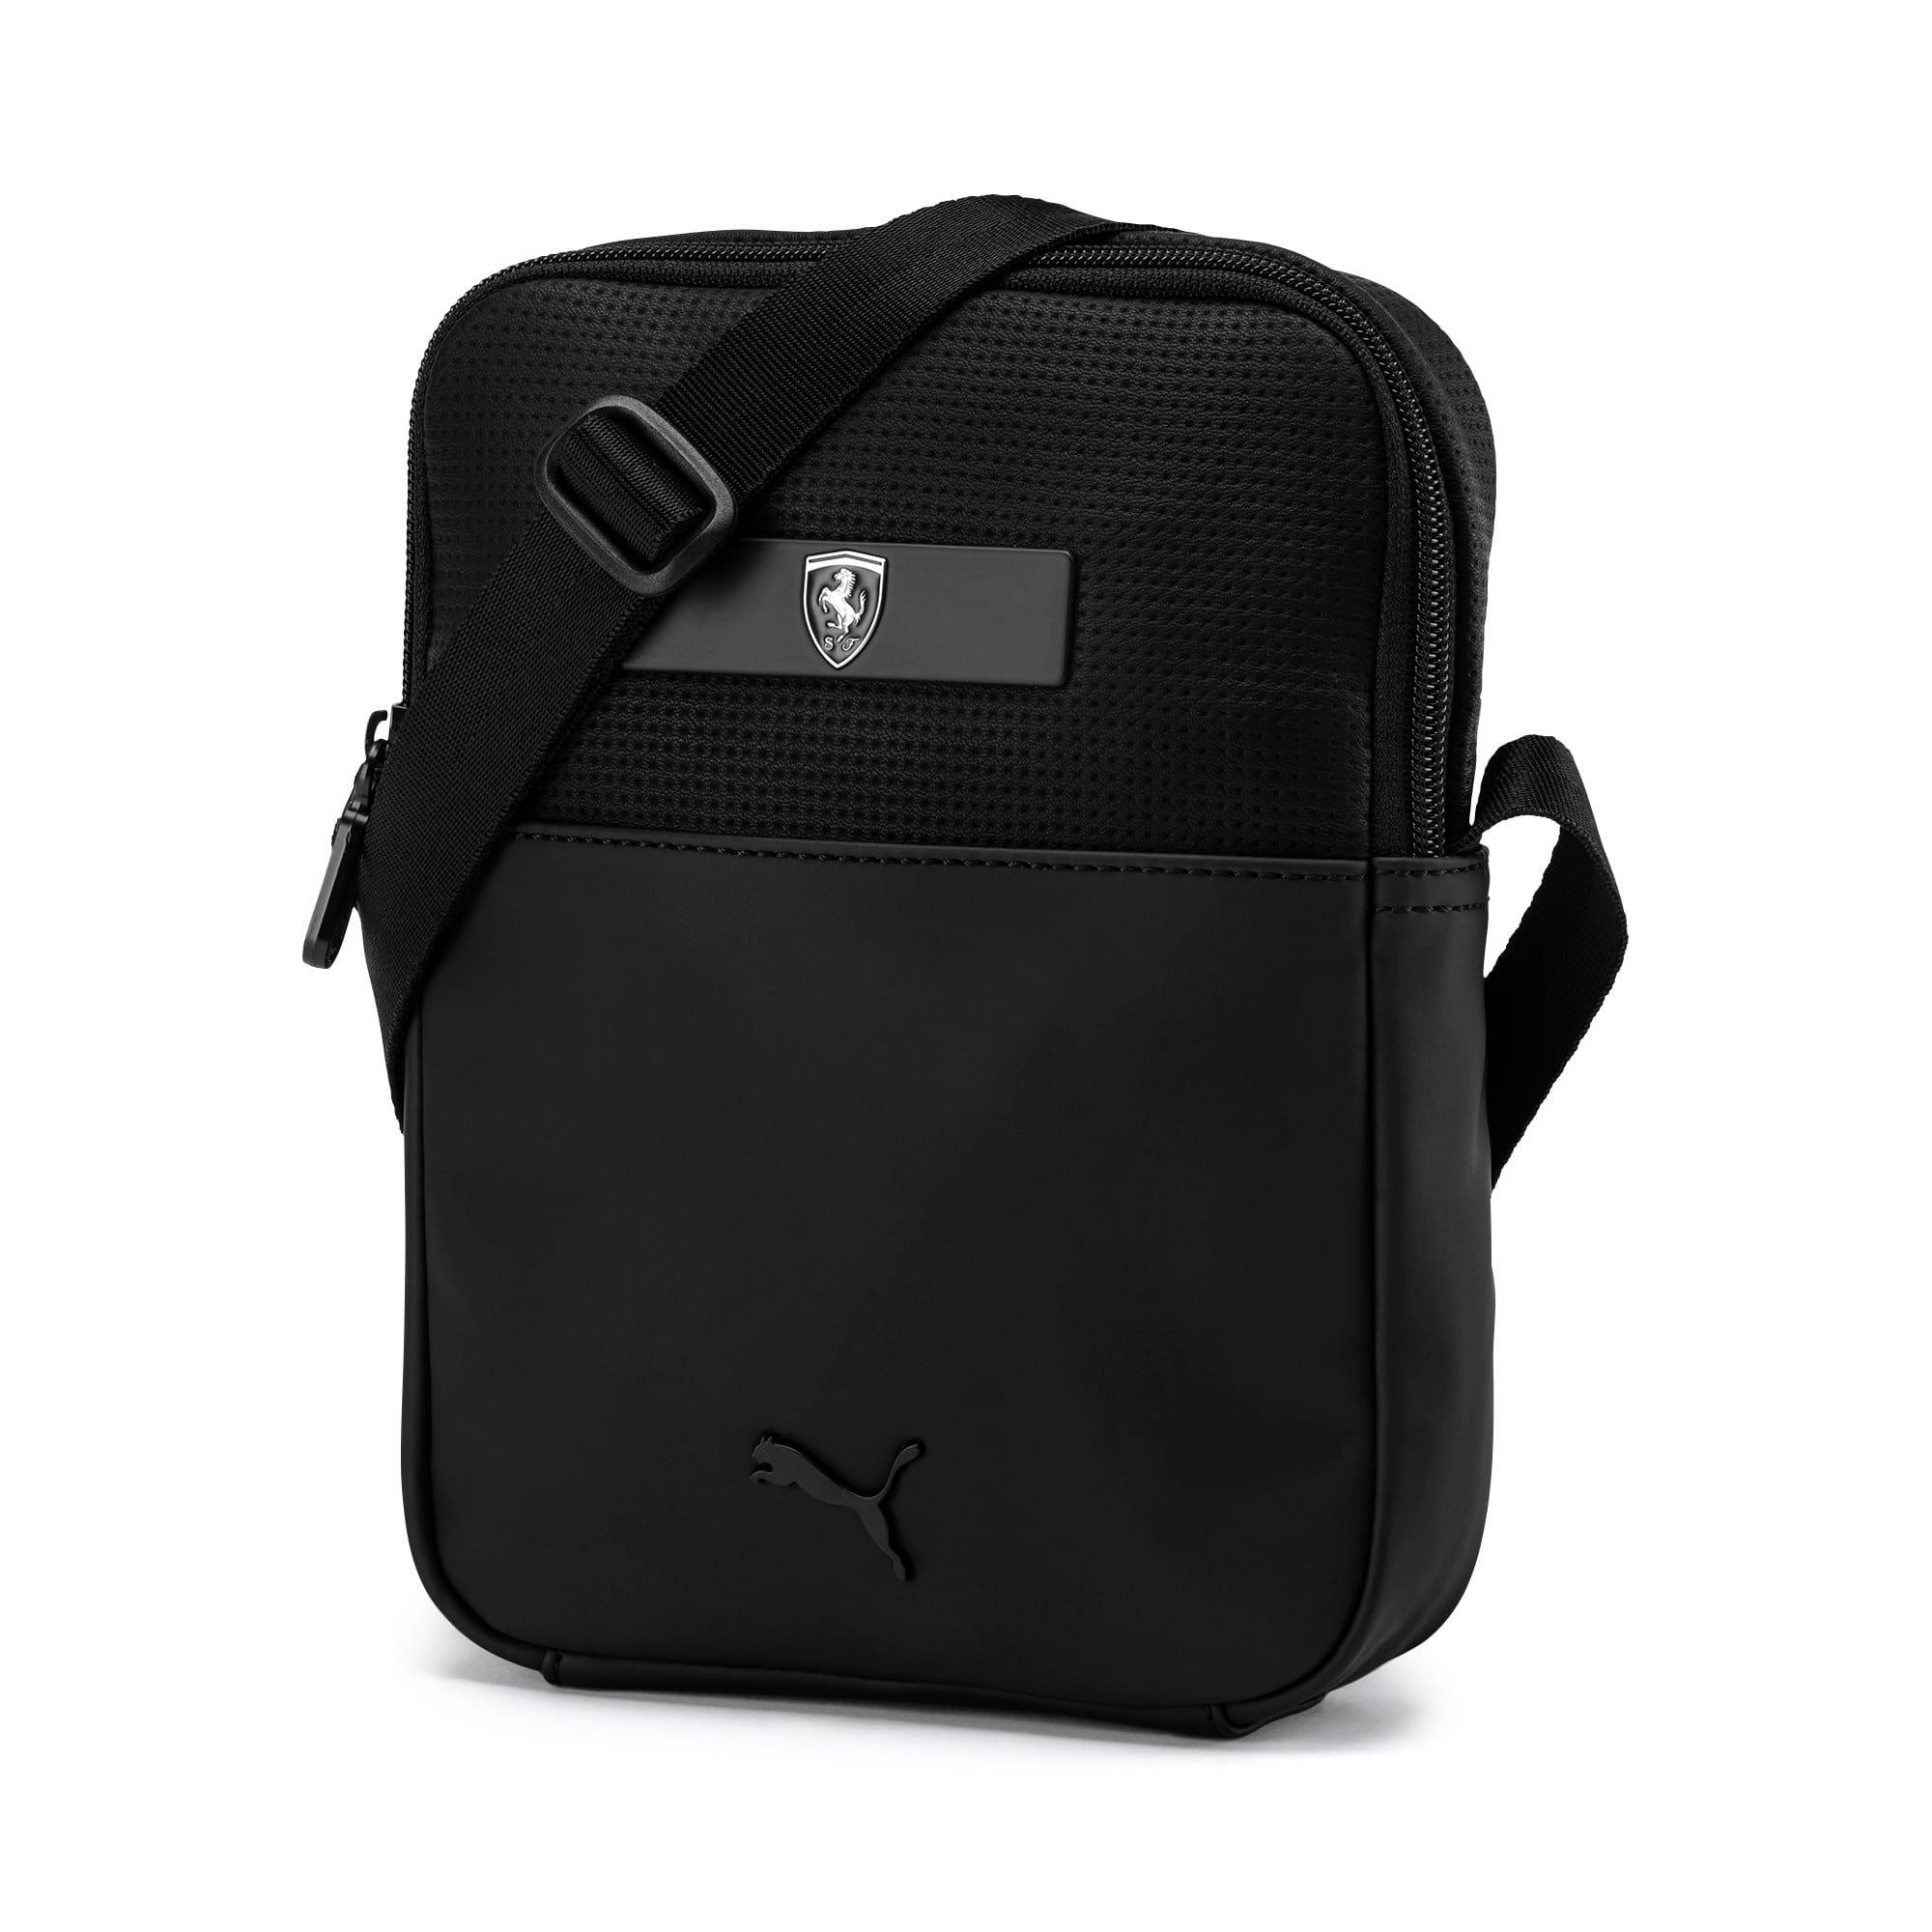 Thumbnail 1 of Ferrari Lifestyle Portable Bag, Puma Black, medium-IND